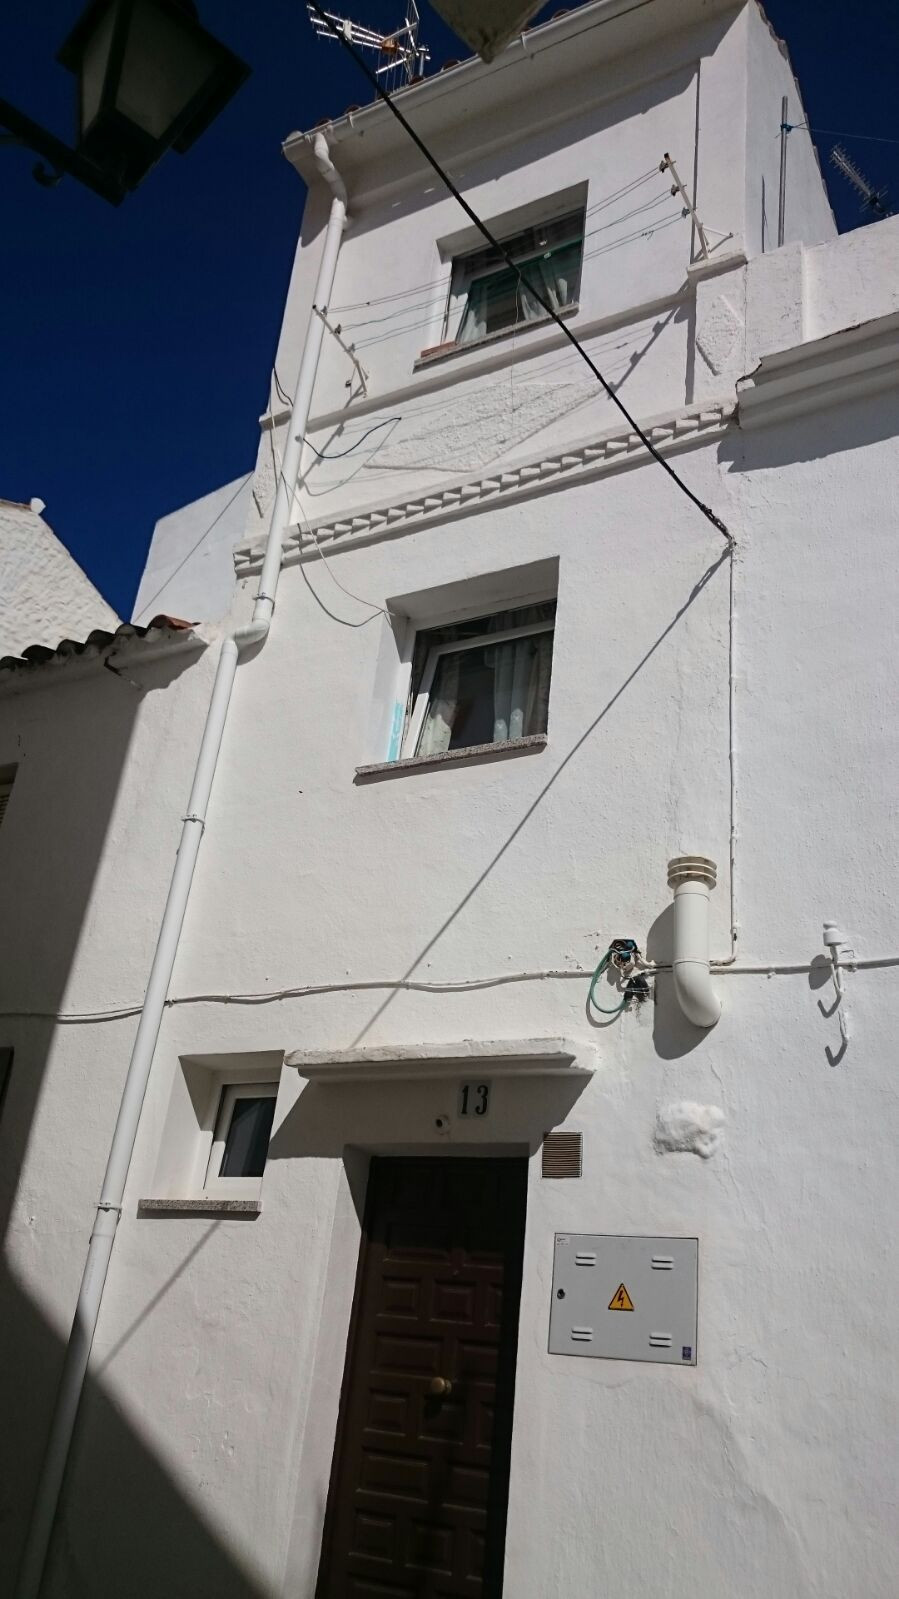 Townhouse for Sale in Ojen, Costa del Sol